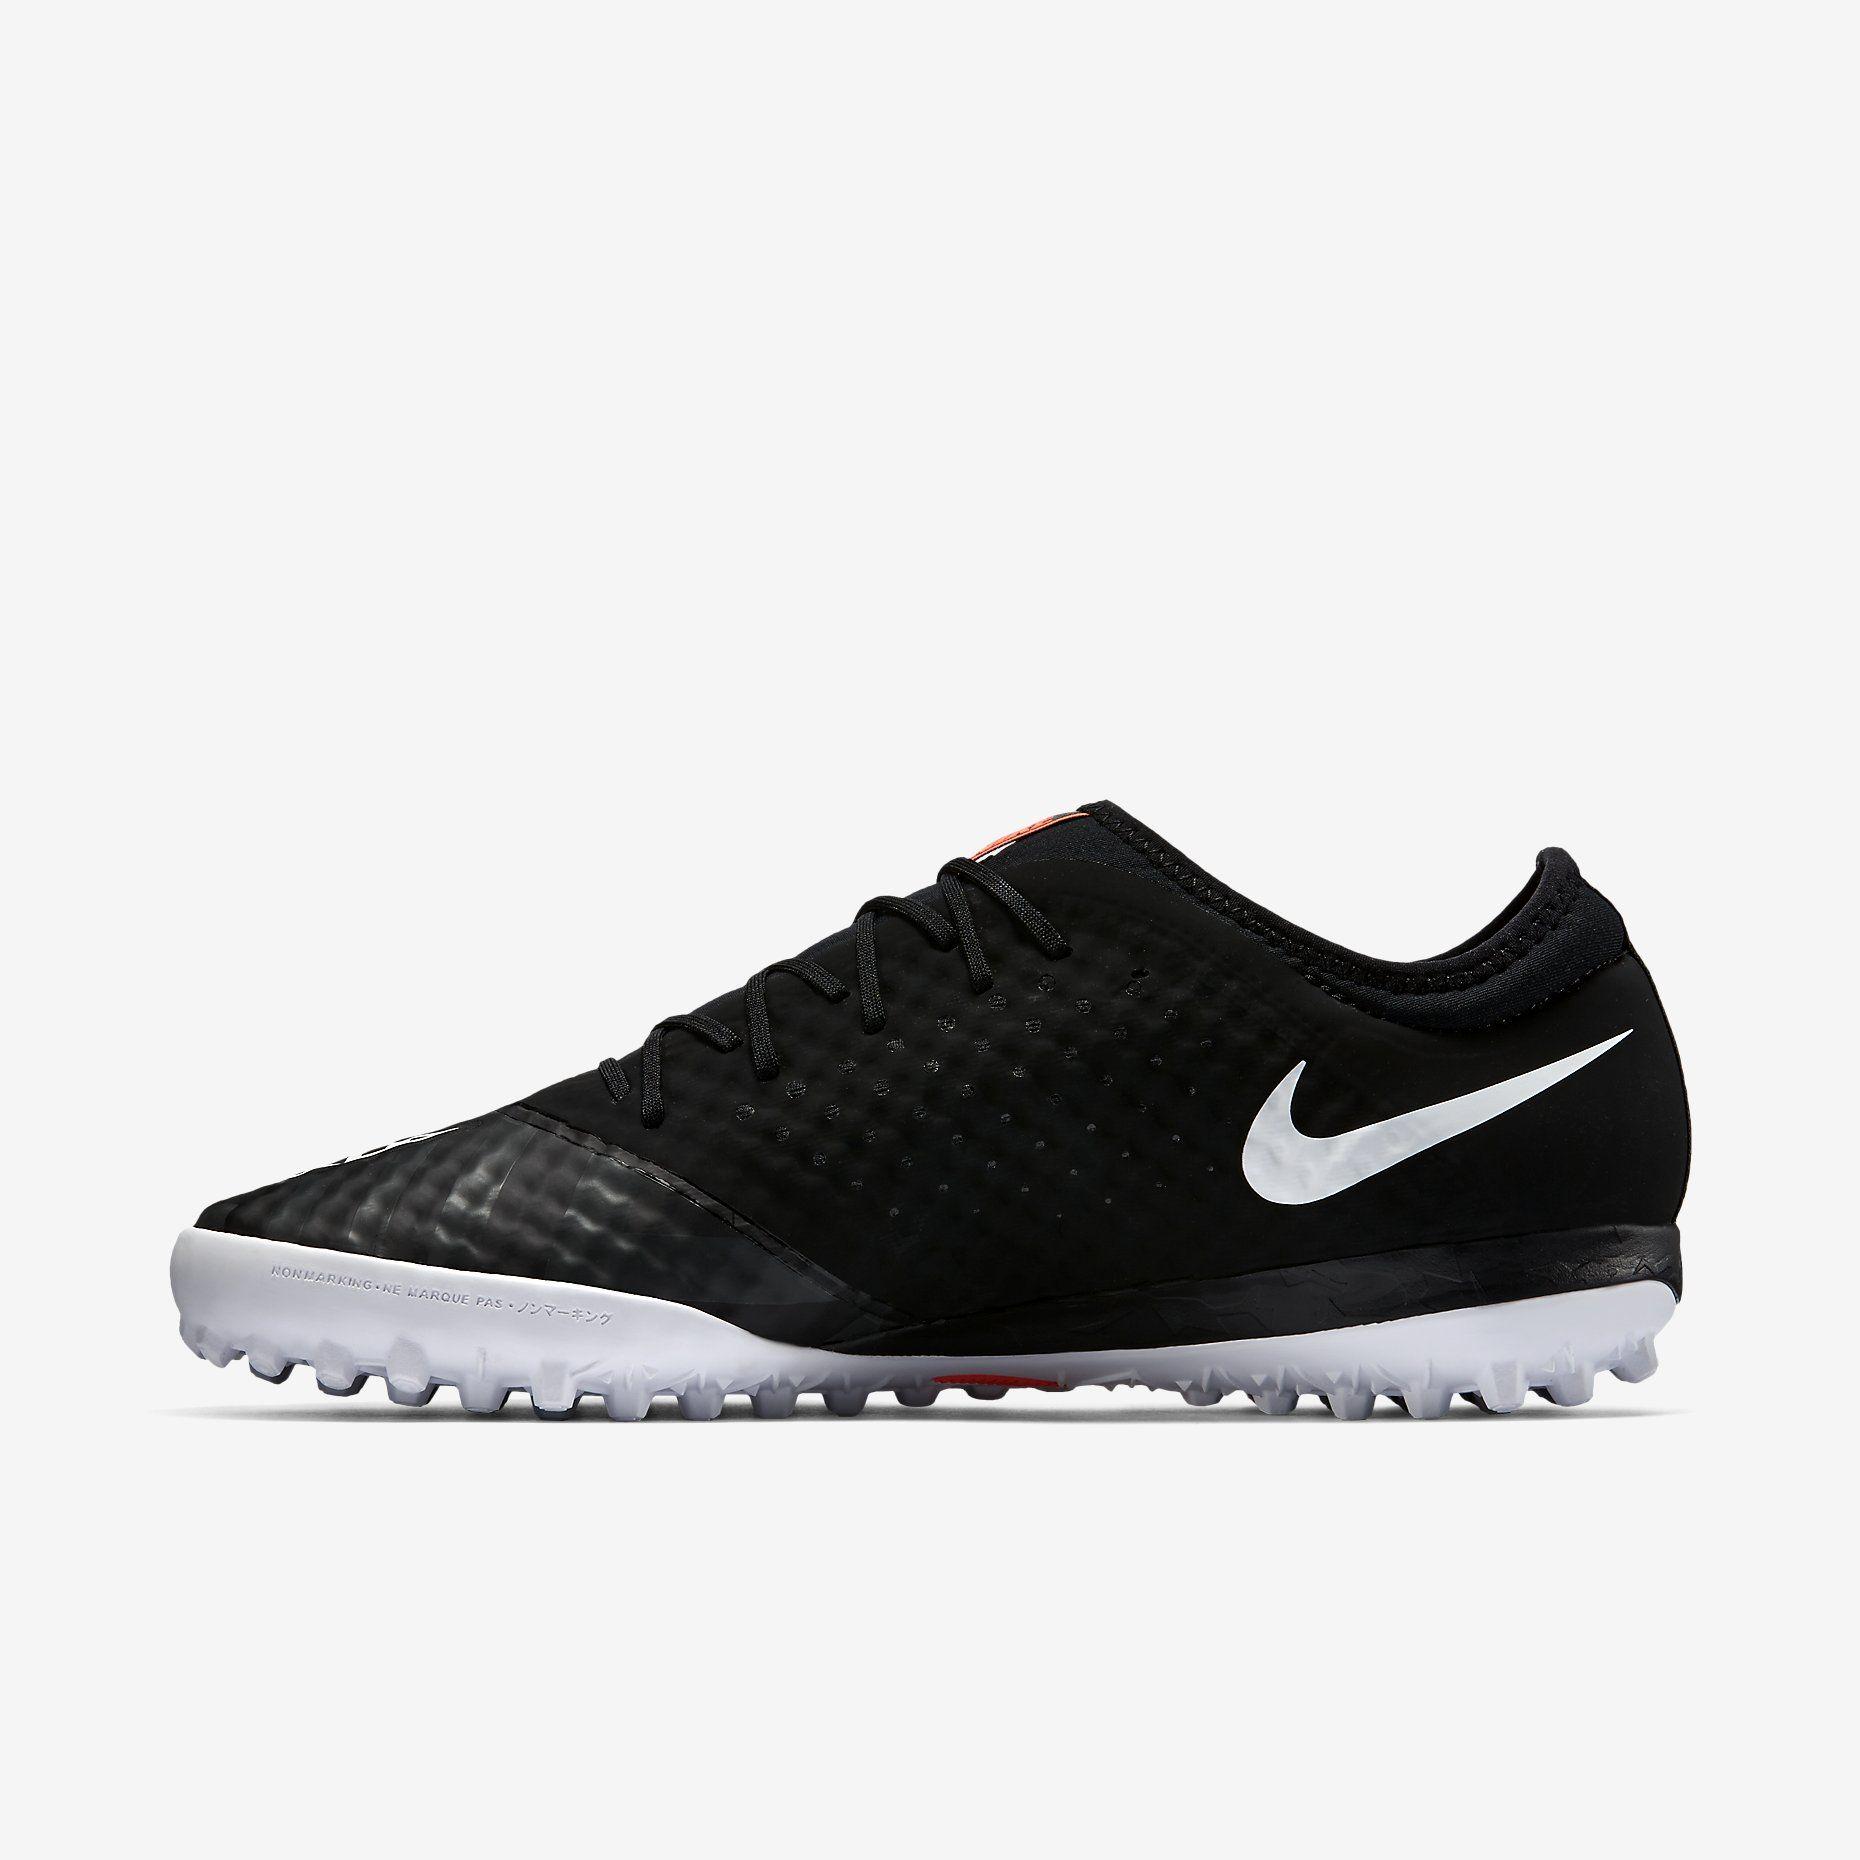 New Look Nike Indoor Football Shoes Mercurialx Finale Street Black Orange A40e5830